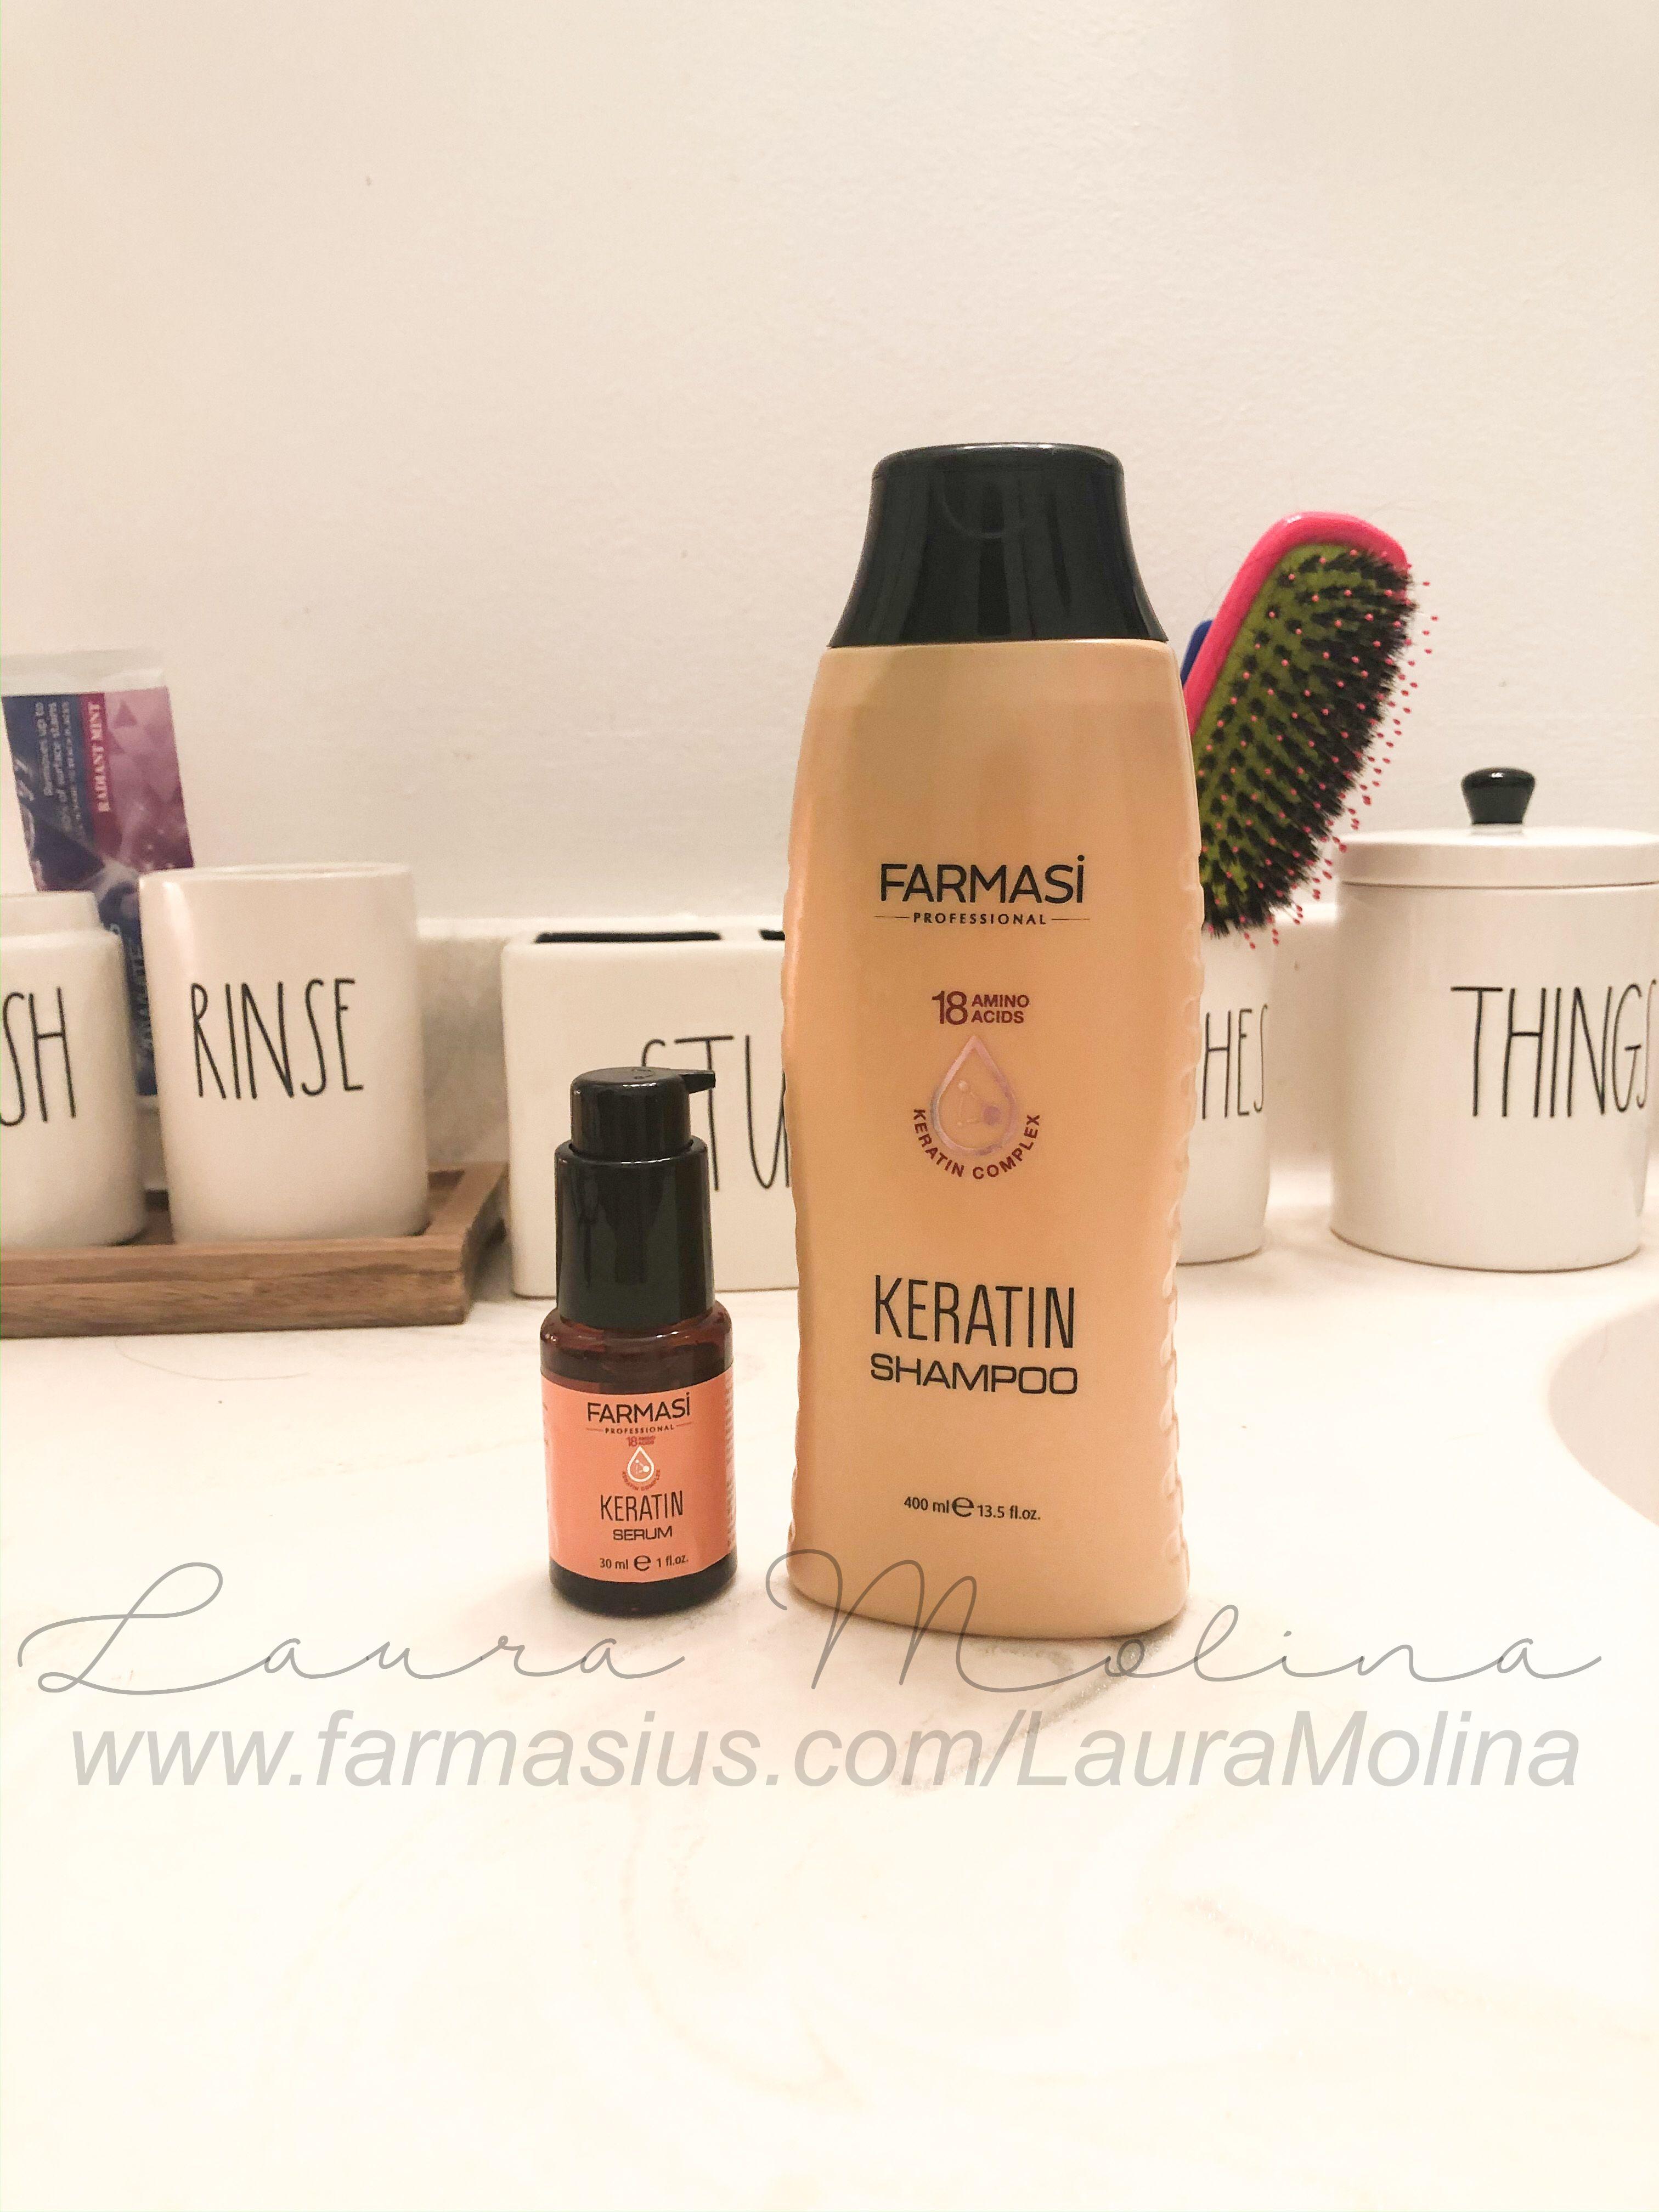 Pin by Laura Molina on Farmasi in 2020 Keratin, Shampoo